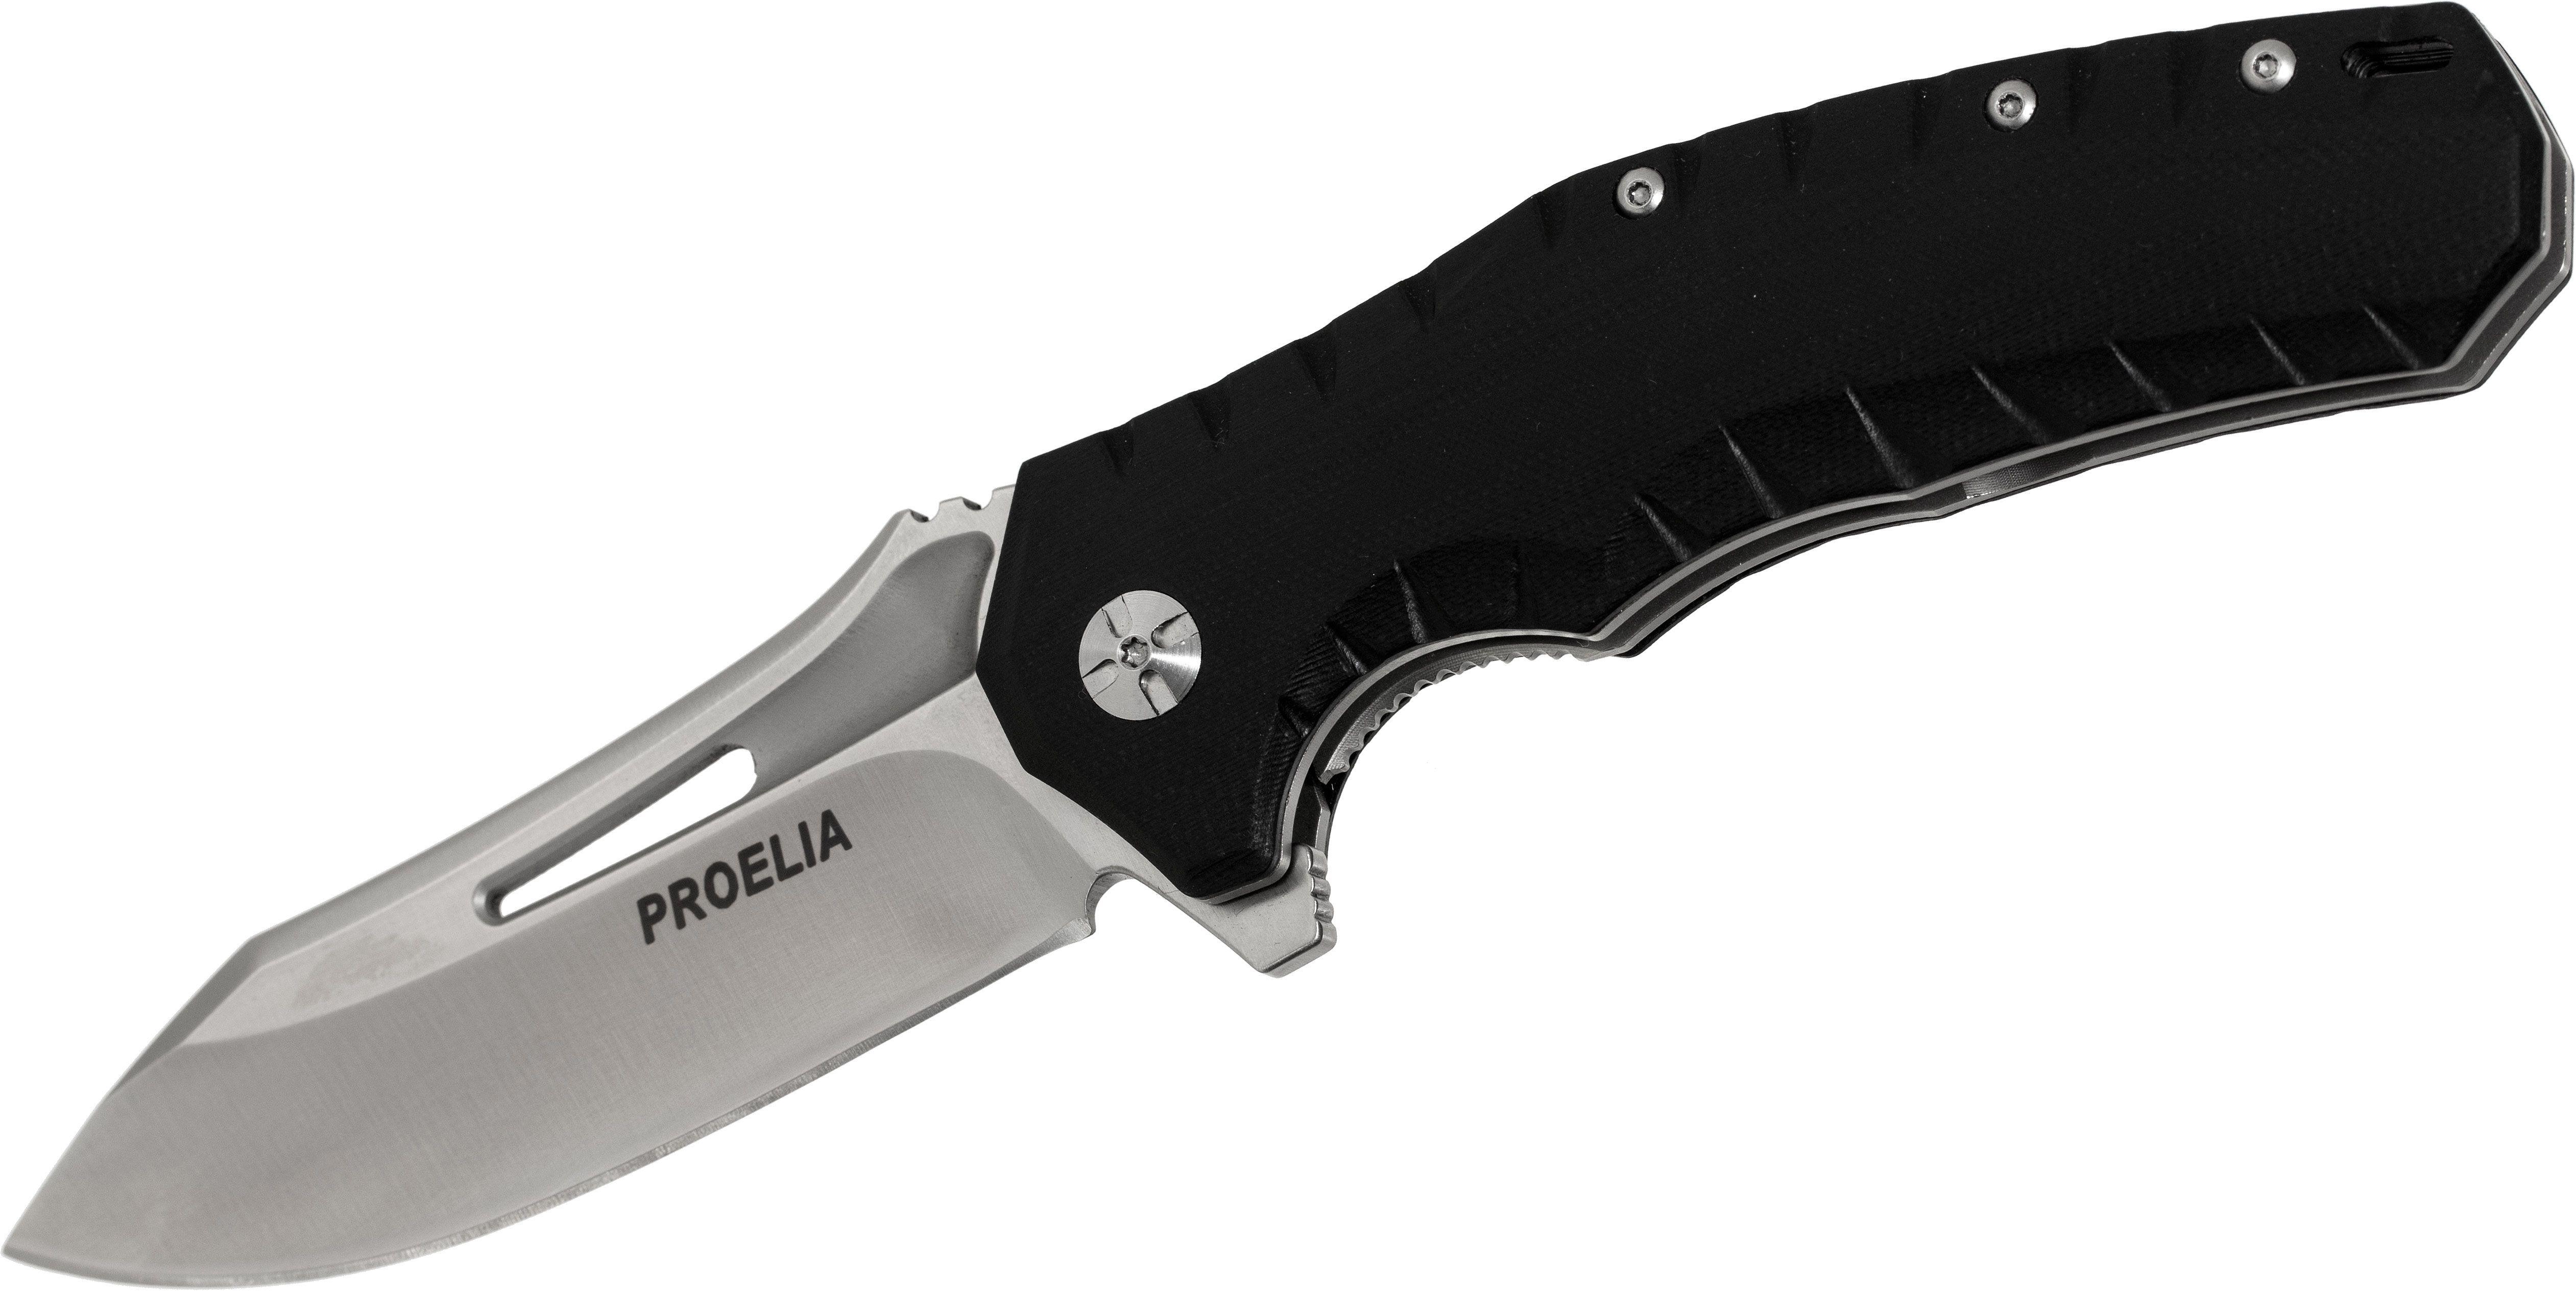 Proelia Knives TX020 Tactical Folder 4 inch Satin D2 Drop Point Blade, Black G10 Handles